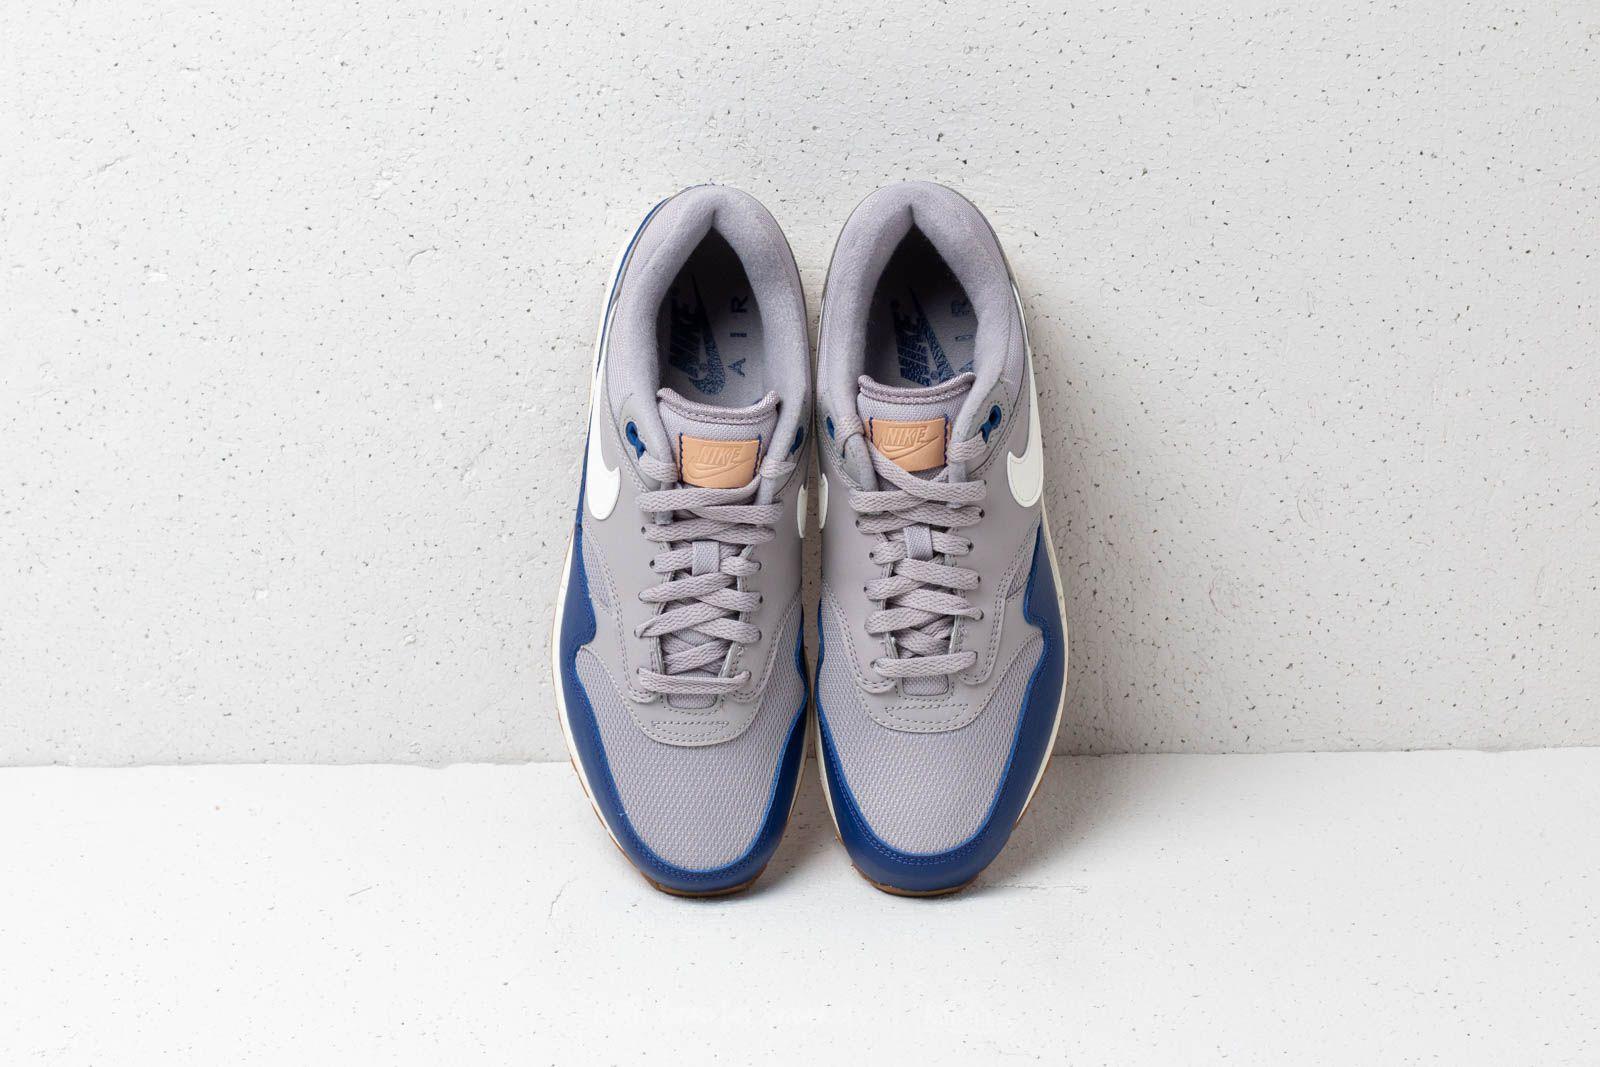 Nike Air Max 1 Atmosphere Grey  Sail at a great price 136 € buy at d0649ca4d